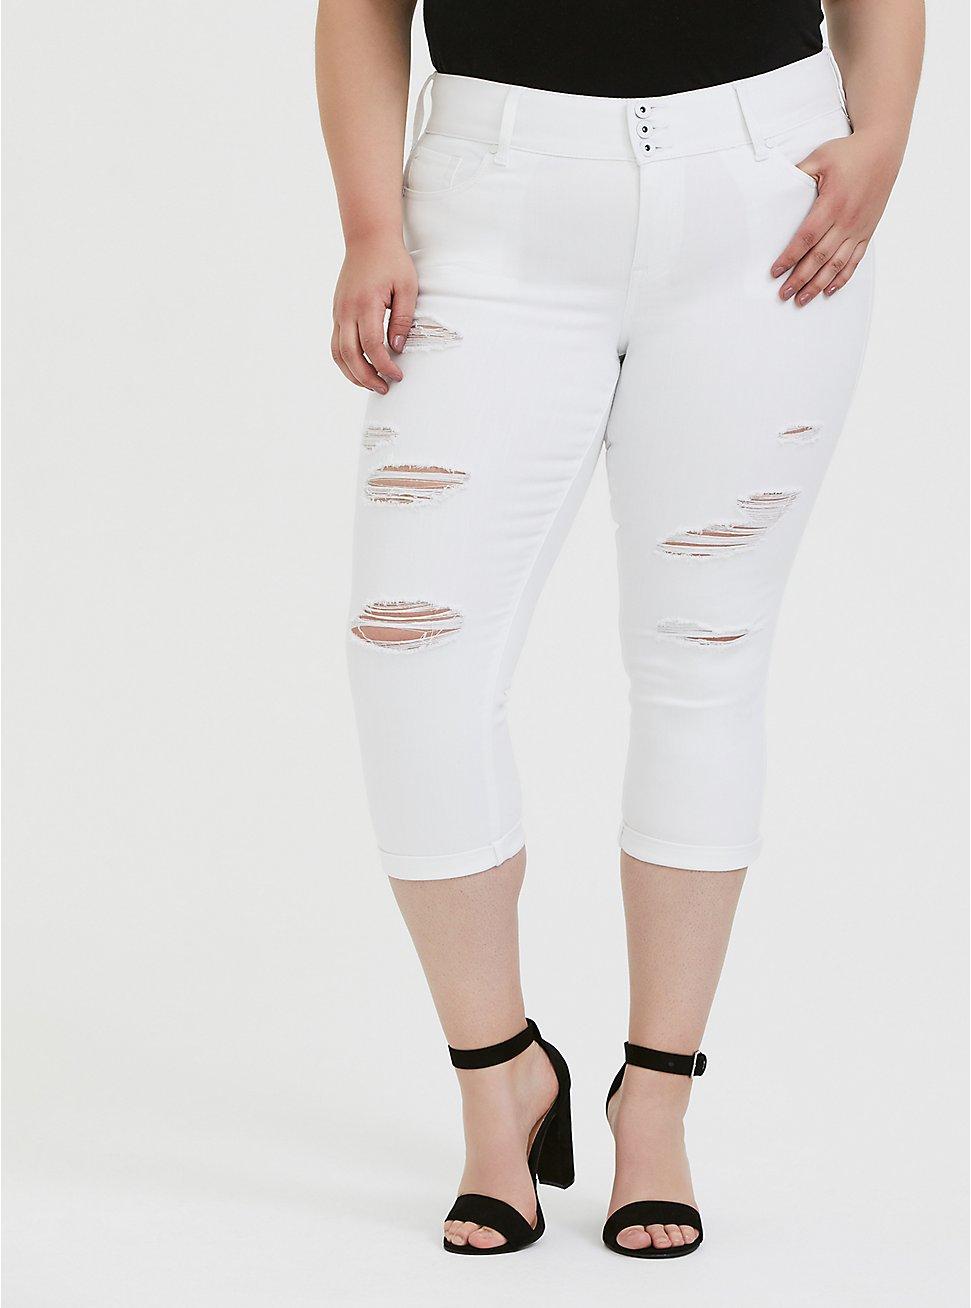 Crop Jegging - Vintage Stretch White, OPTIC WHITE, hi-res